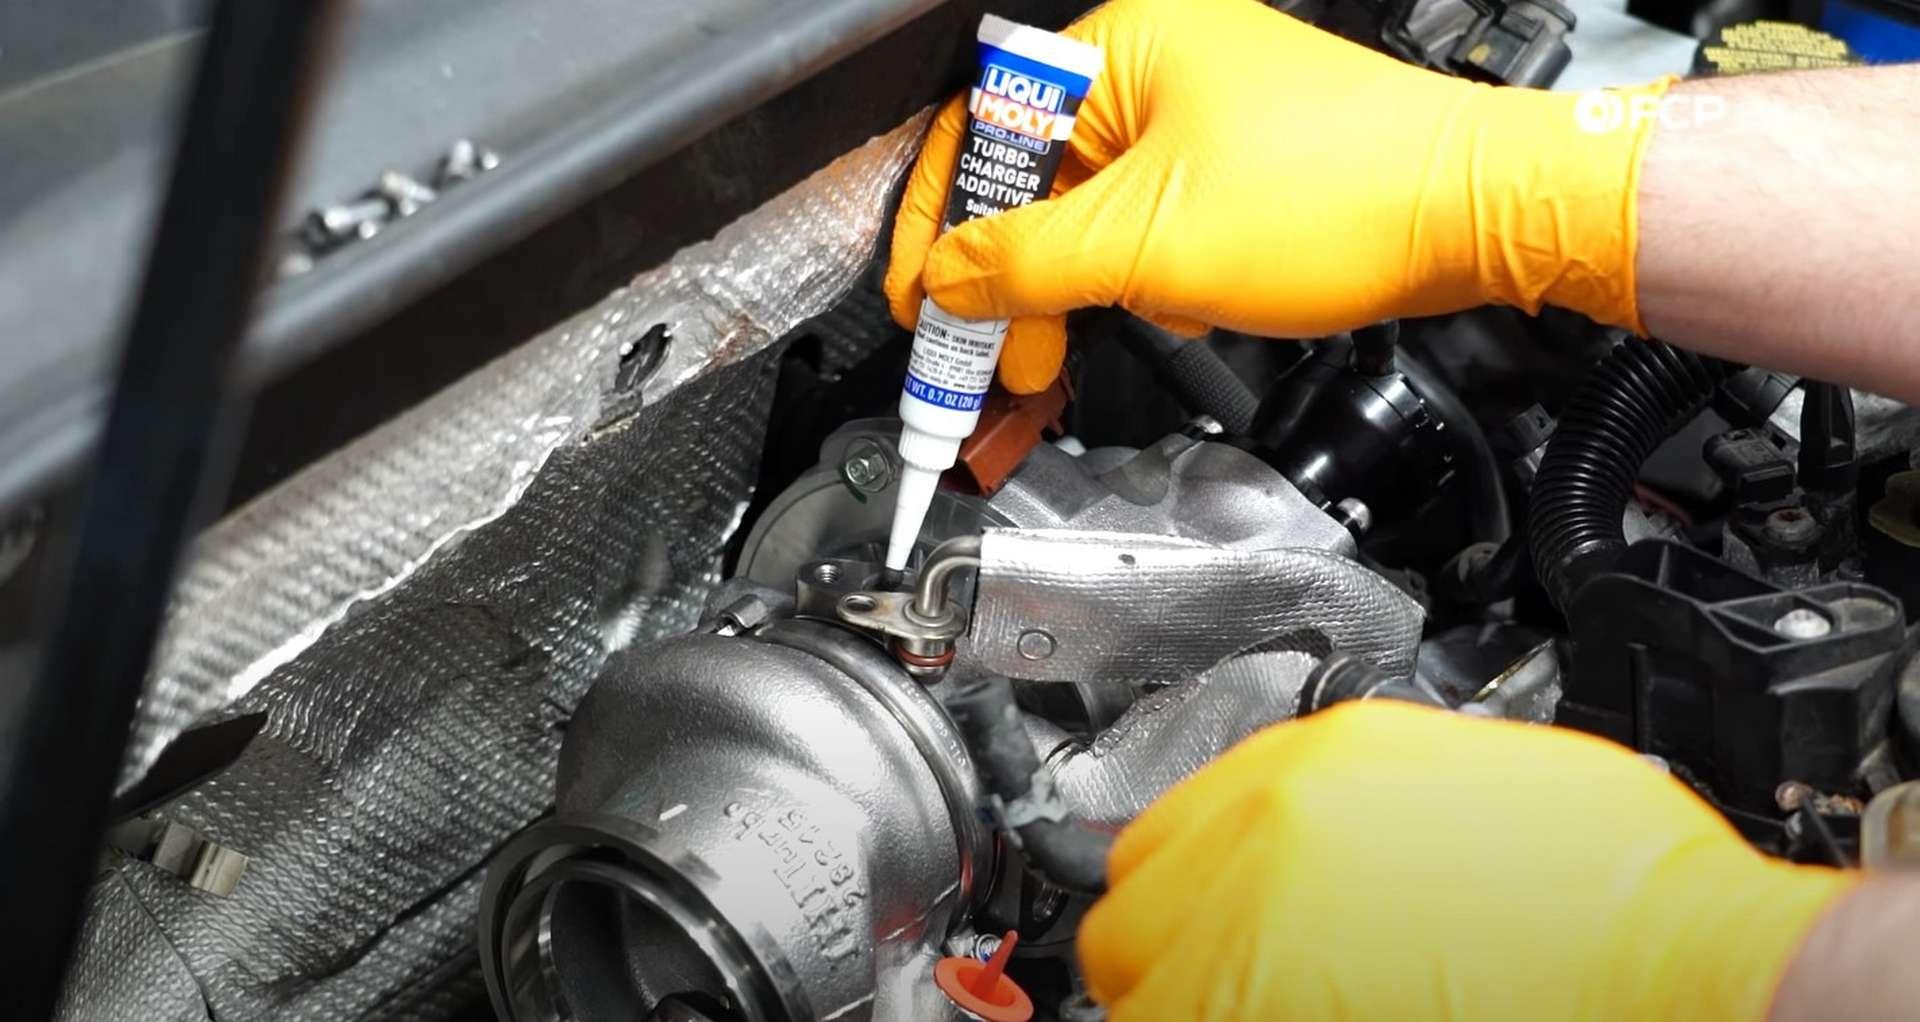 DIY MK7 VW GTI Turbocharger Upgrade adding the Liqui-Moly additive